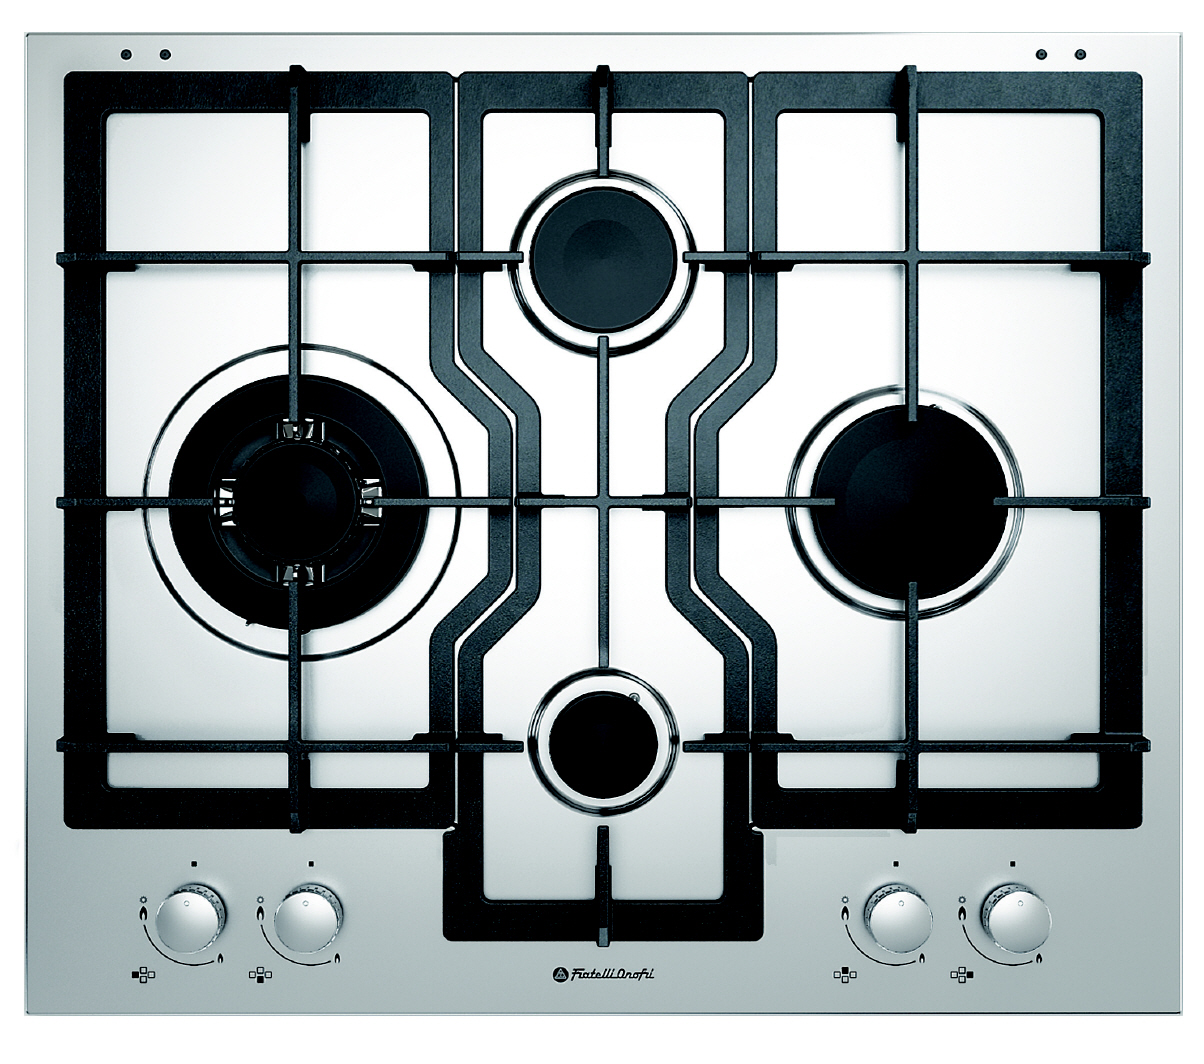 4 zonen wok gas kochfeld. Black Bedroom Furniture Sets. Home Design Ideas